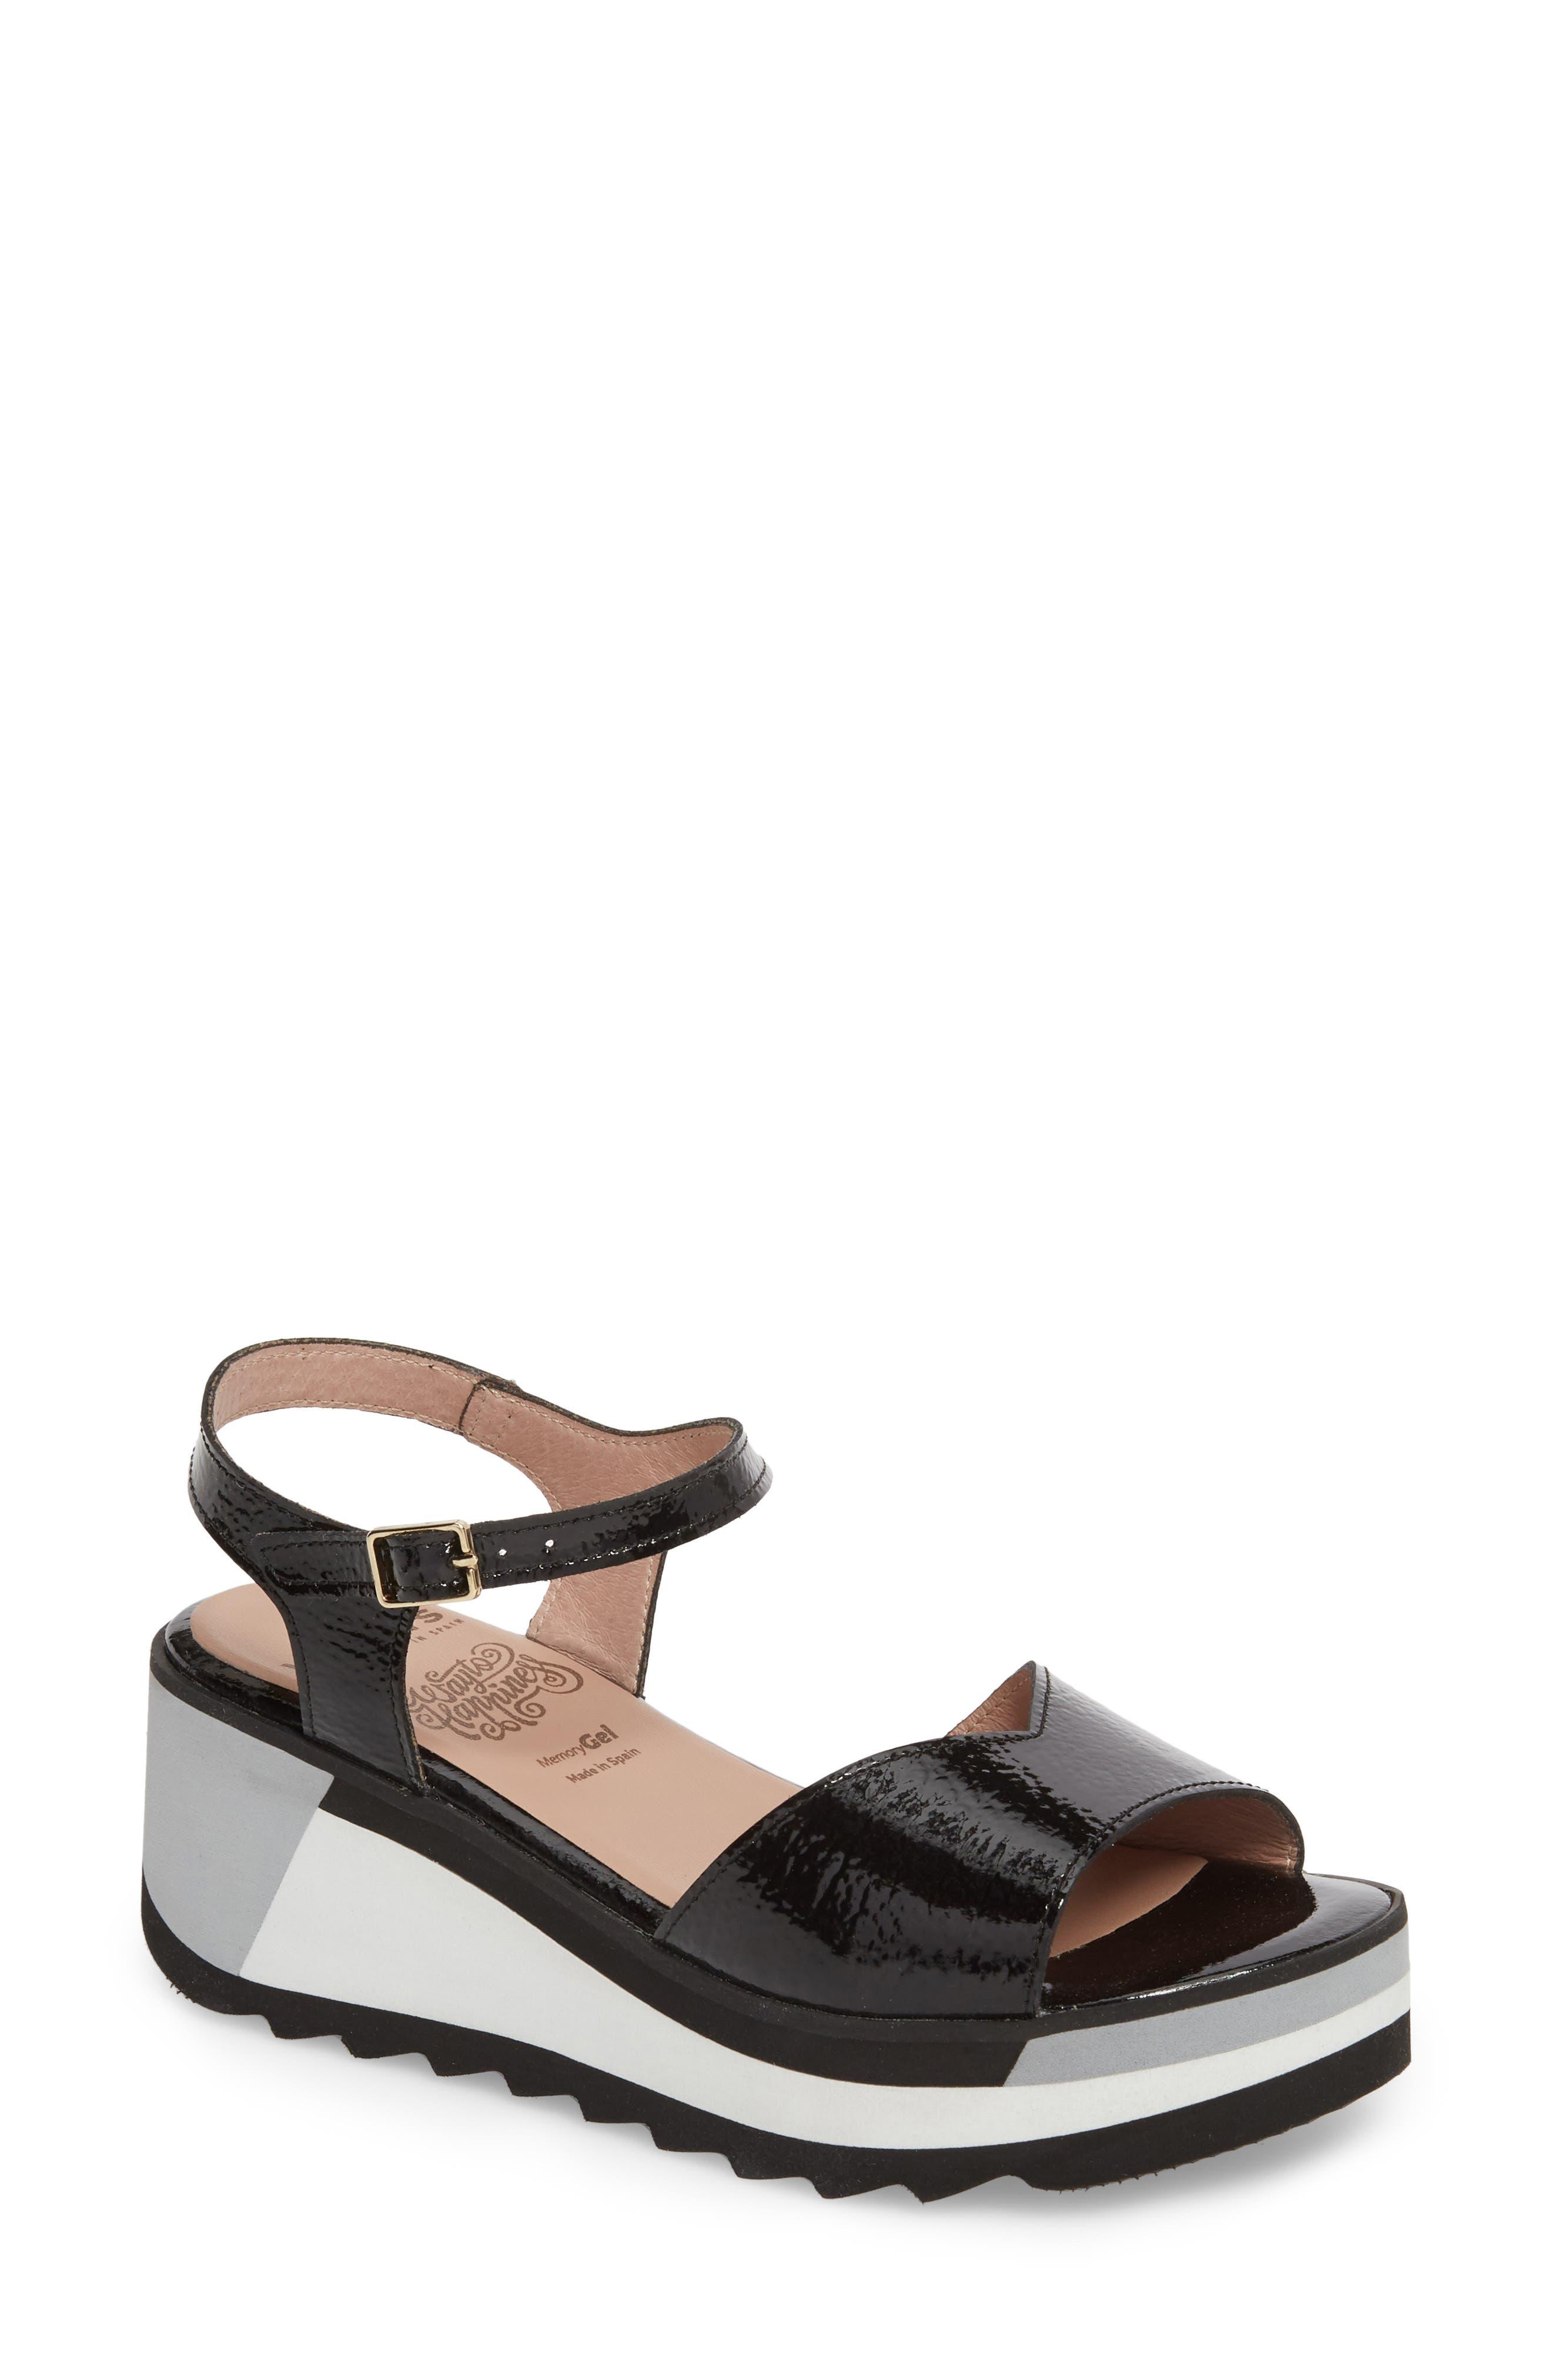 D-7810 Sandal,                             Main thumbnail 1, color,                             Black Patent Leather